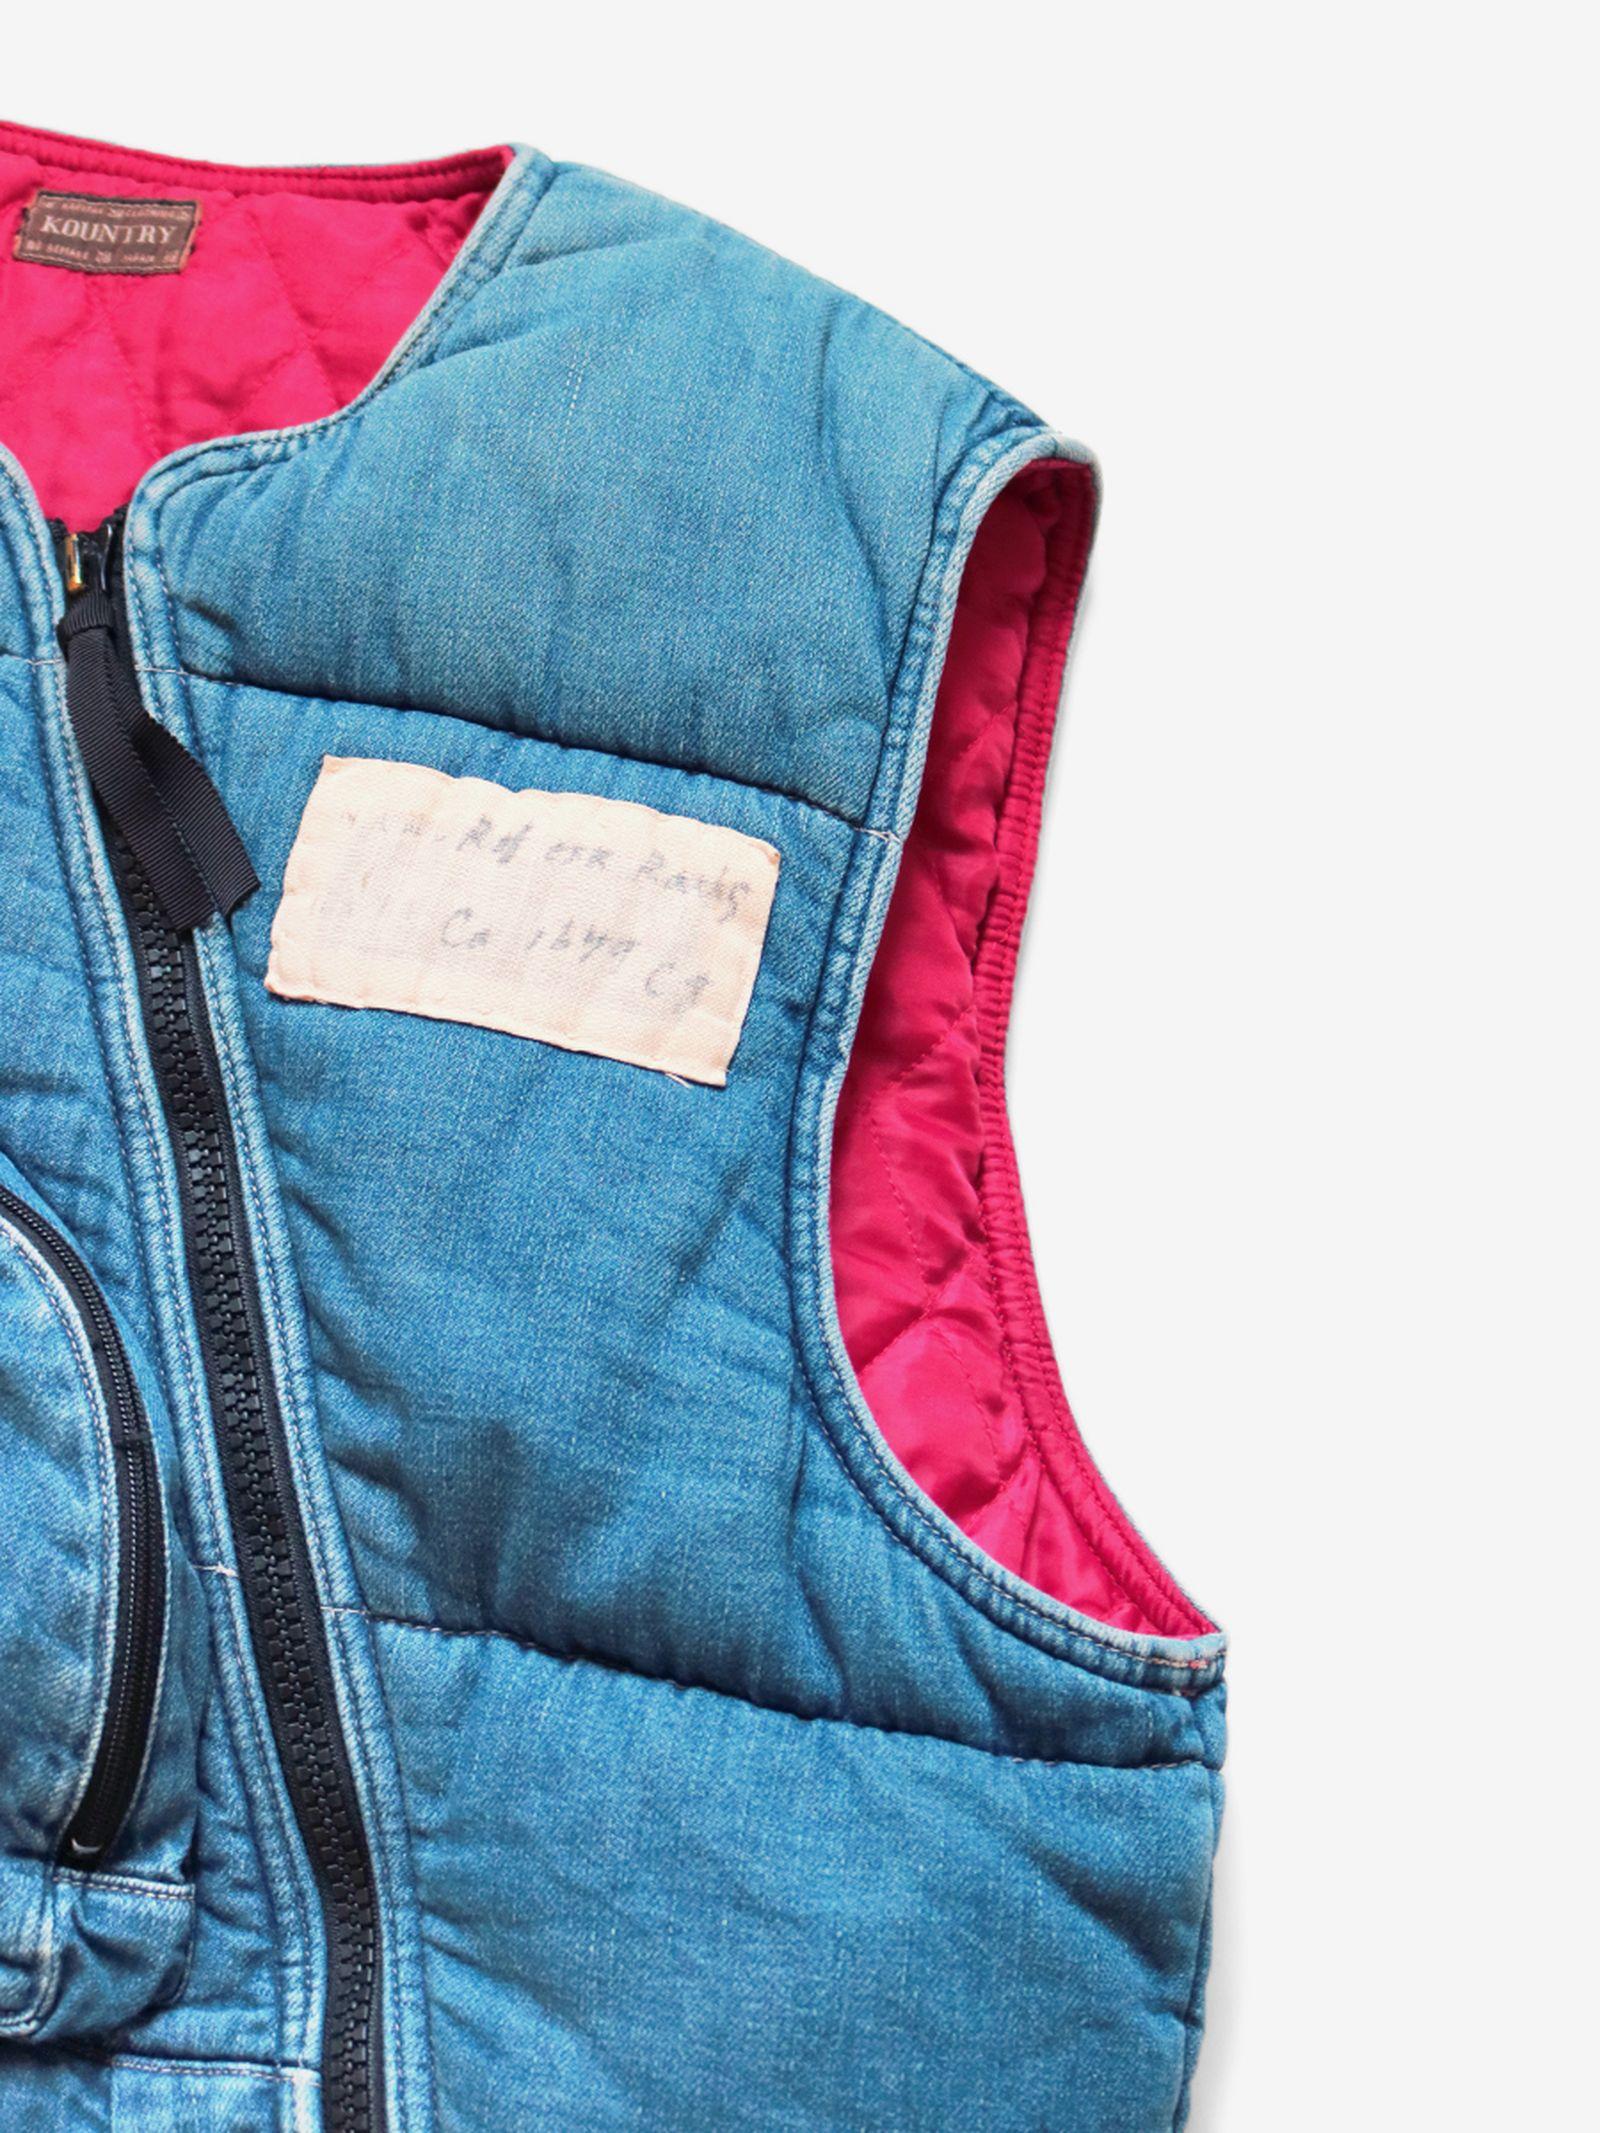 Kapital 8oz Denim Army Flight Vest